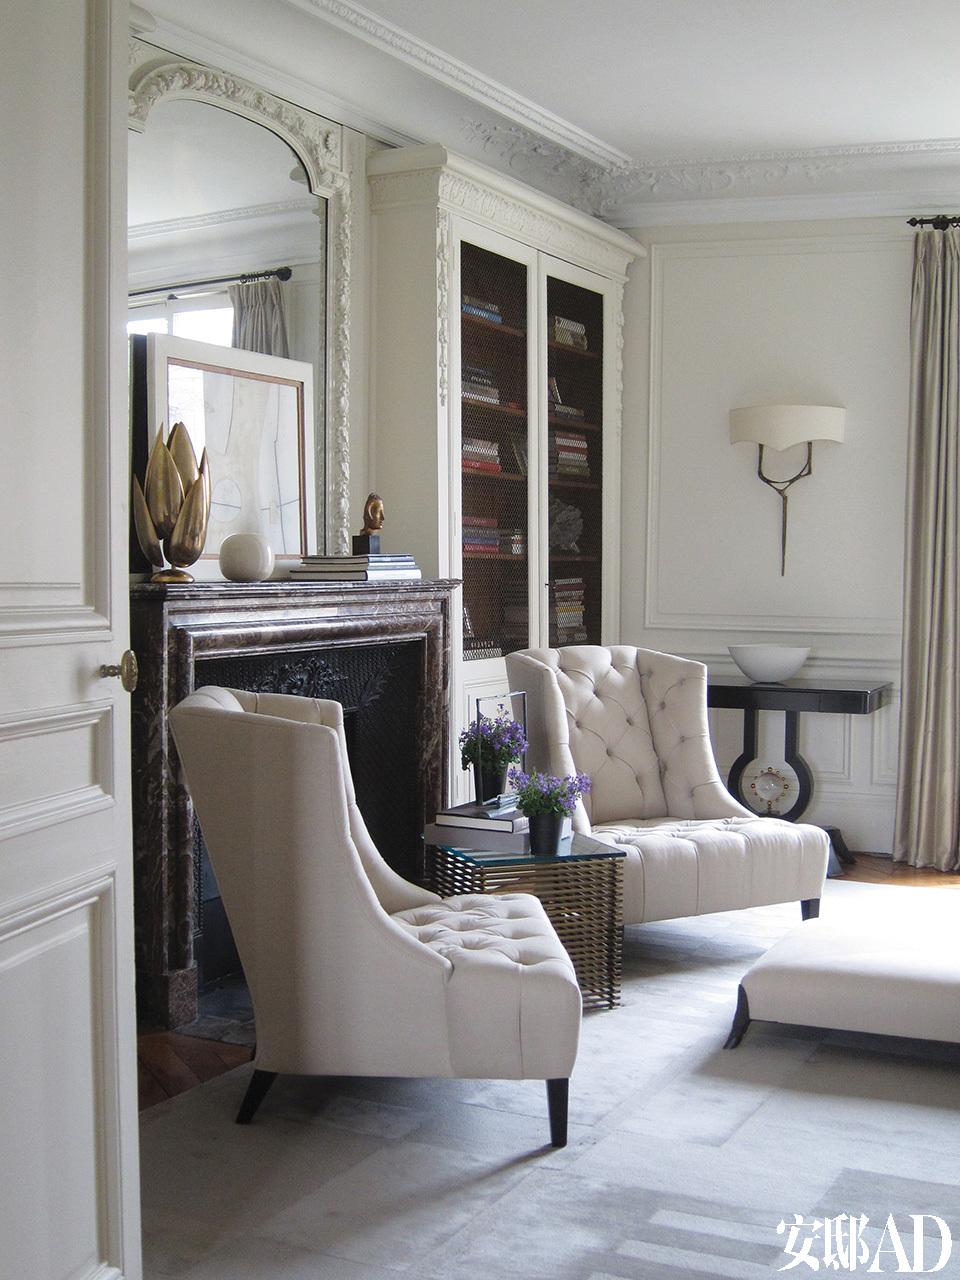 "after 前客厅的另一侧基本保持着改造之前的模样,只是变得更加明媚而丰满了。一对单人沙发上面覆盖着Donghia的浅灰色亚麻布料,它们和后面靠墙的 ""Lens""边桌同样出自Thomas Pheasant STUDIO。"